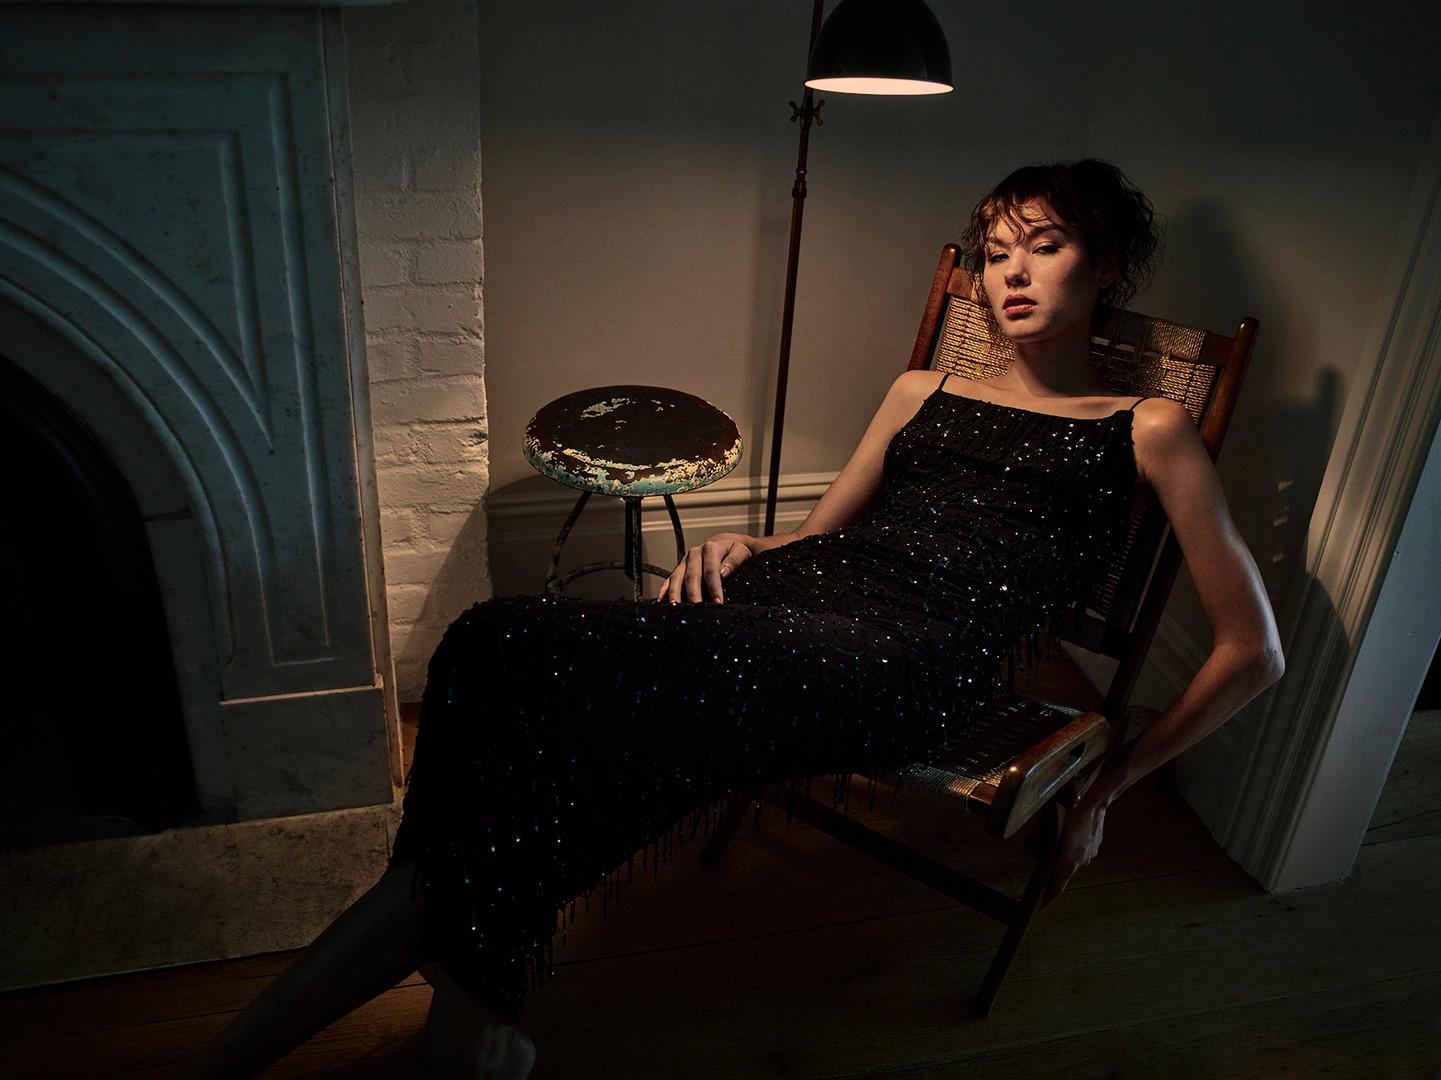 Angelica_chair.jpg